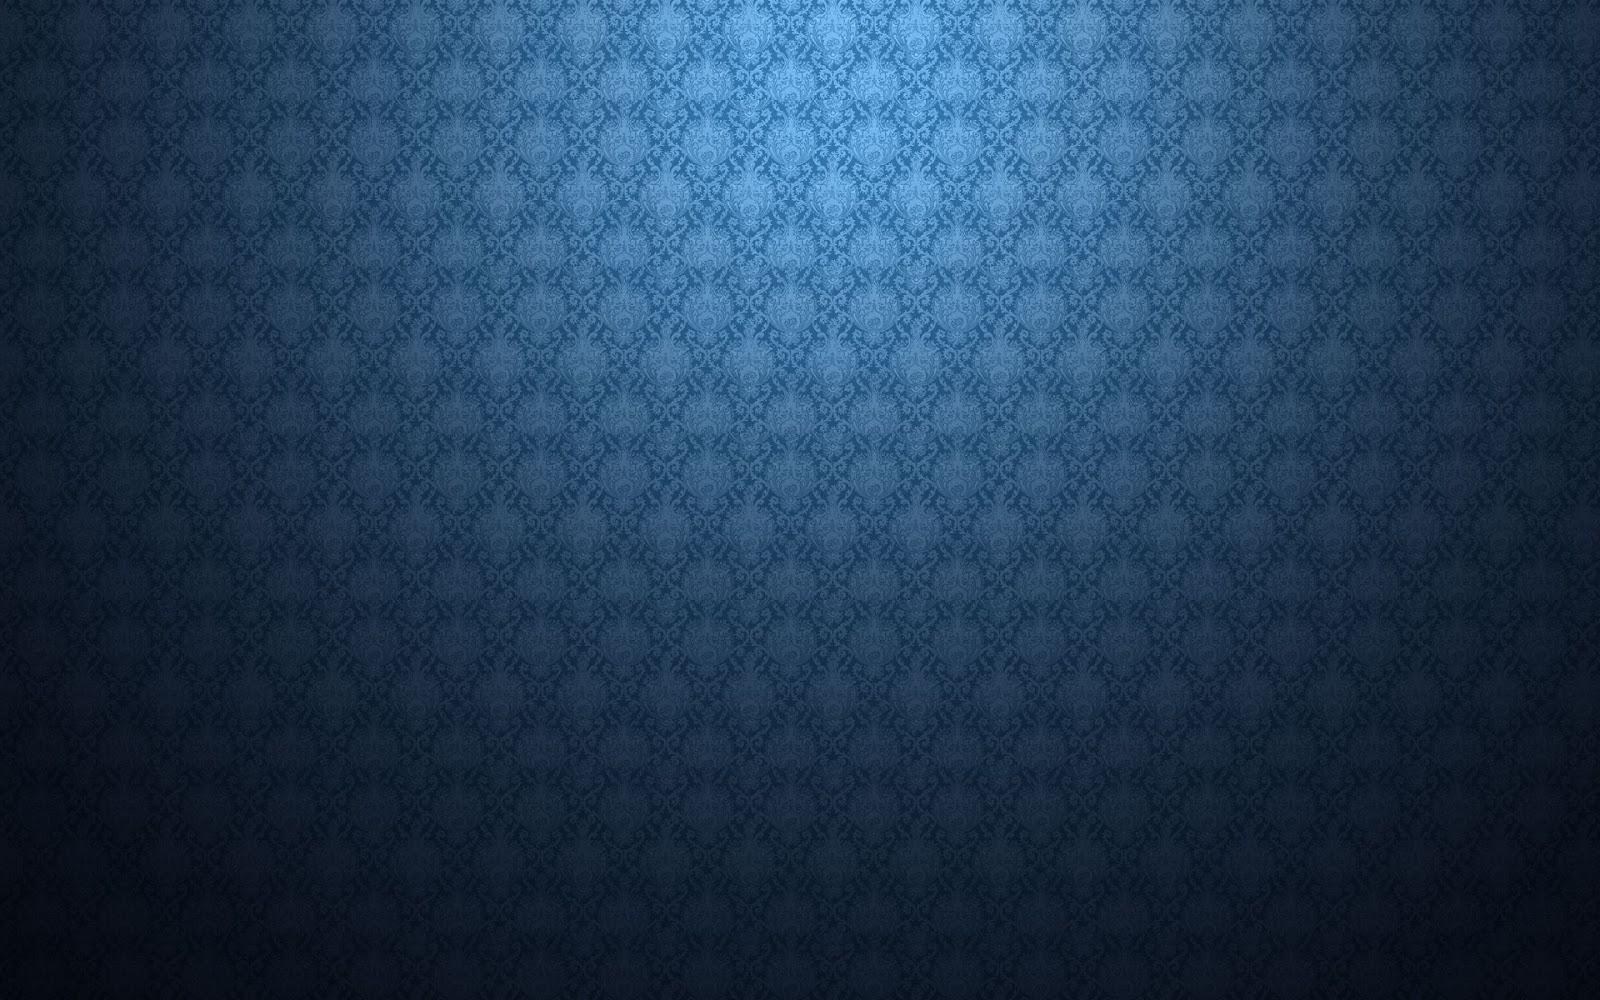 BLUE Art Background Wallpaper Image HD Zeromin0 1600x1000